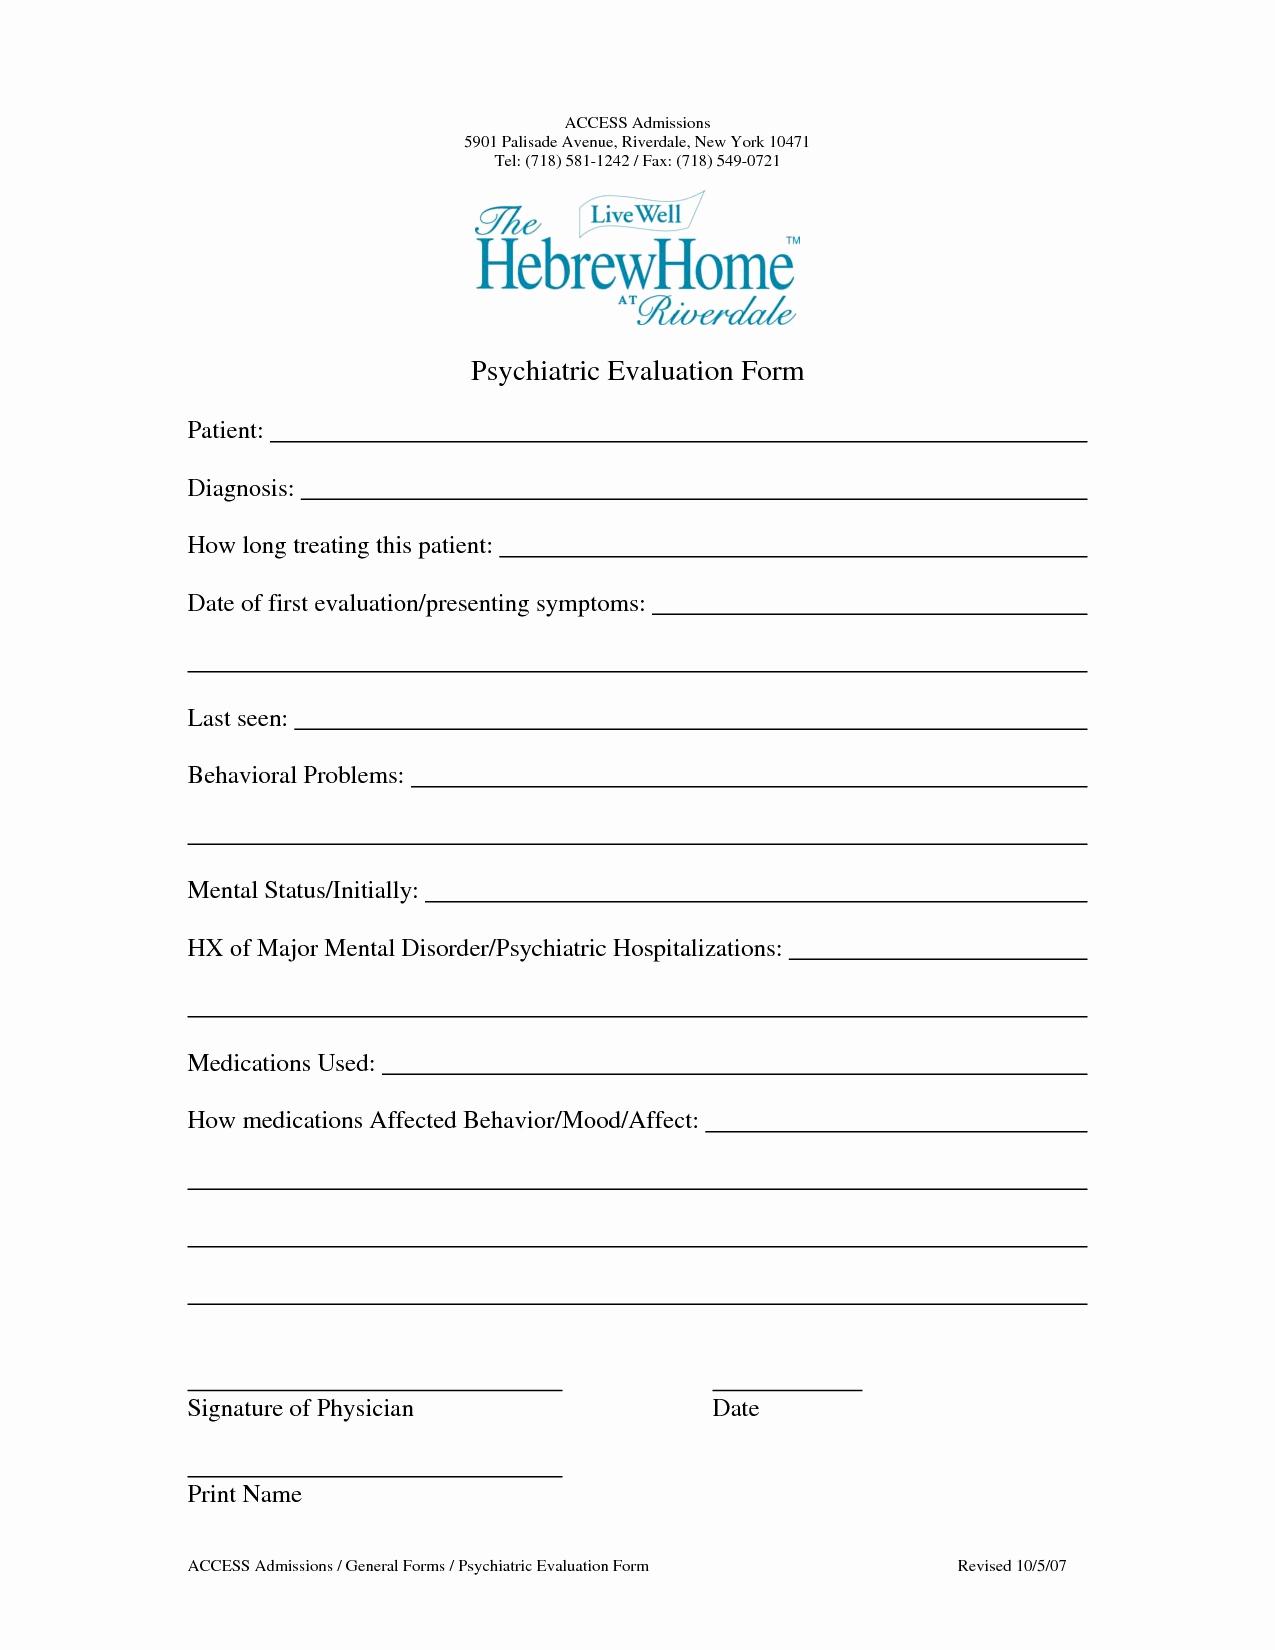 Psychiatric Evaluation form Template Lovely Psychiatric assessments Поиск по тегам Библиотека книг